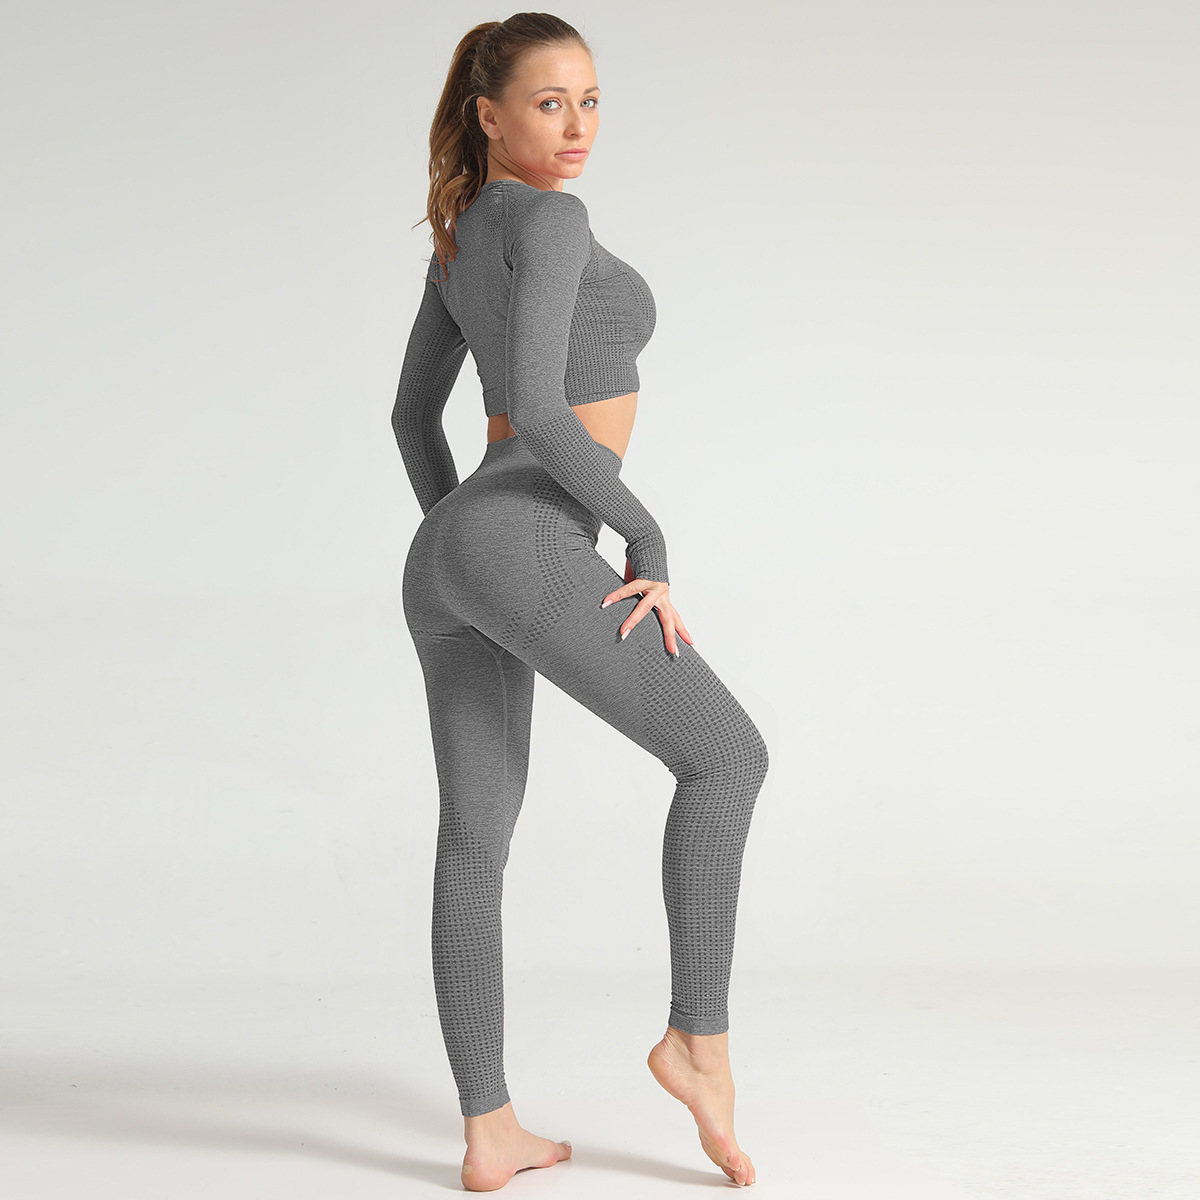 2020 Spring Summer Women Gymwear Seamless Bra Peach Butt Leggings Knitting  Yoga Set 3